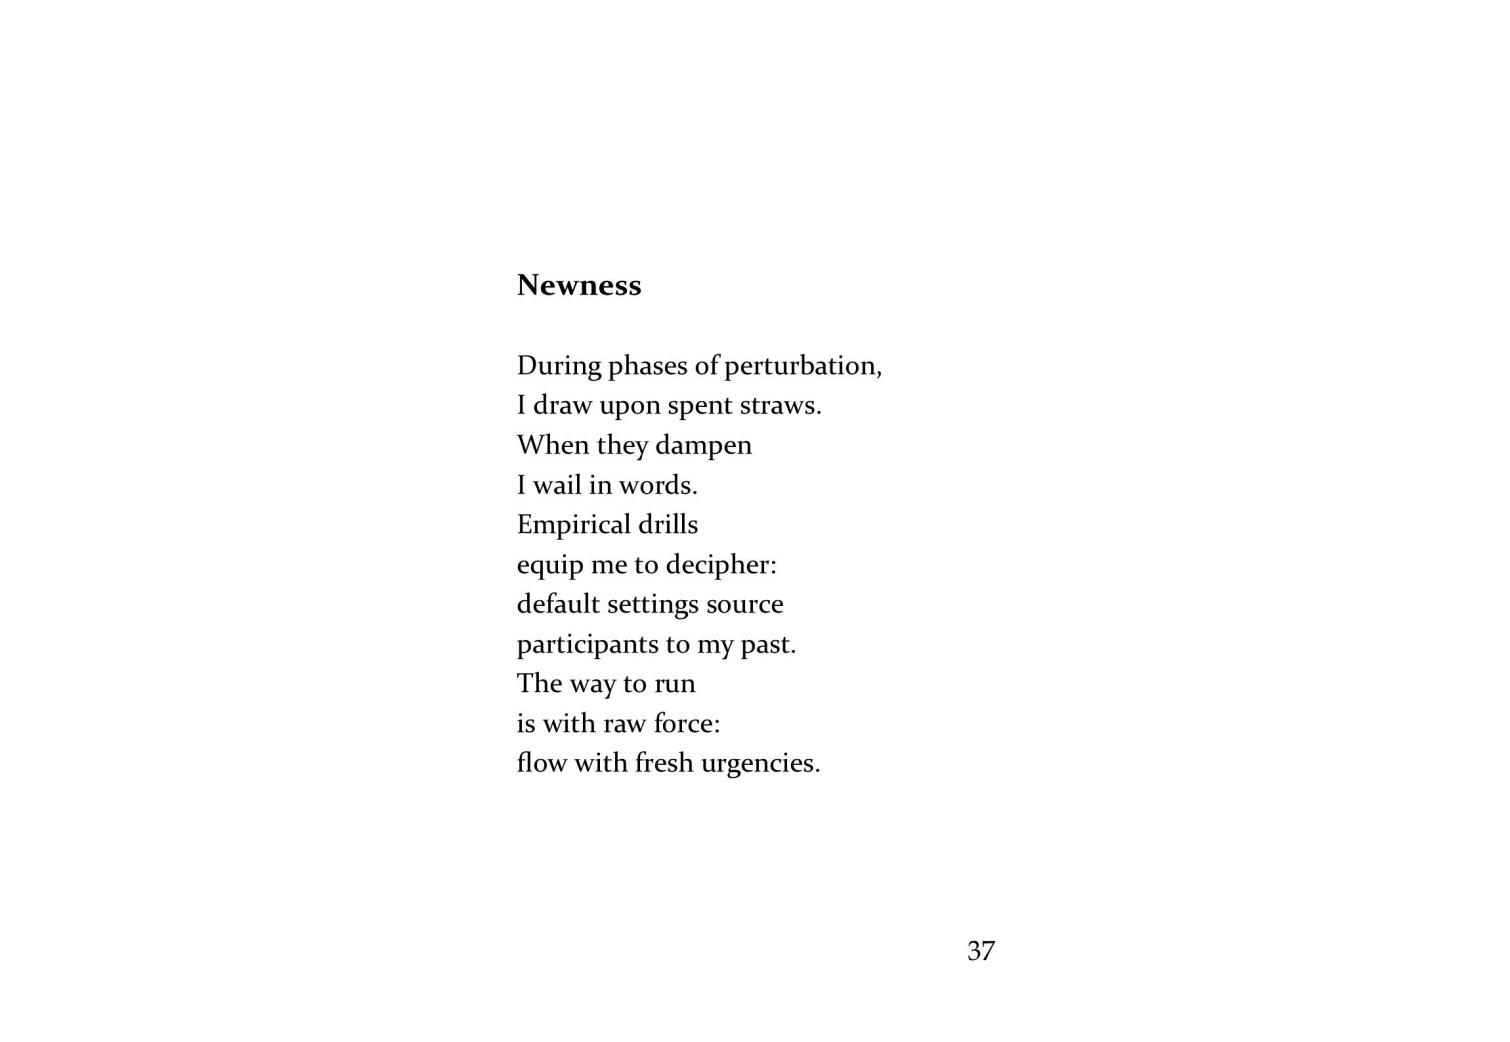 newness by sanjeev sethi